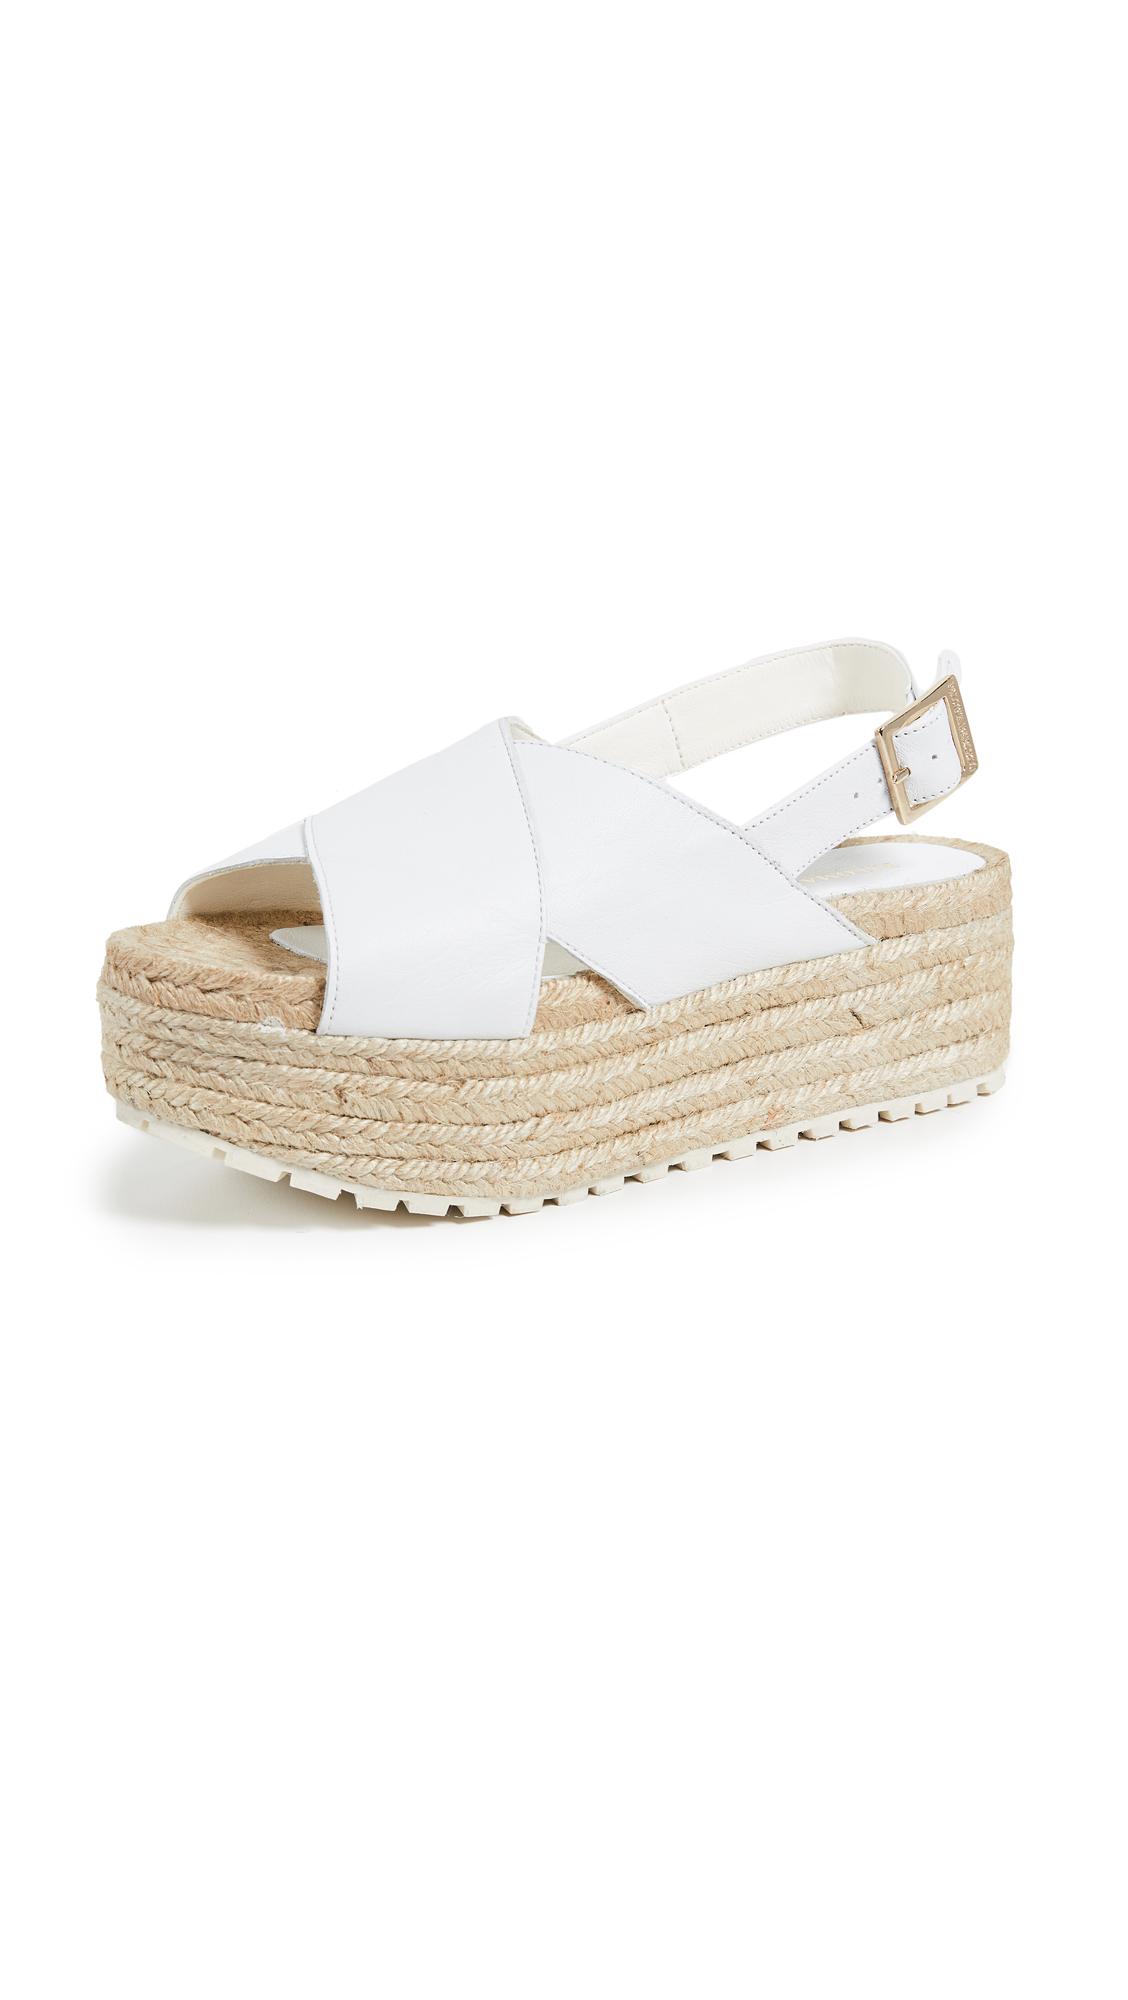 Paloma Barcelo Guaria Flatform Espadrille Sandals - White